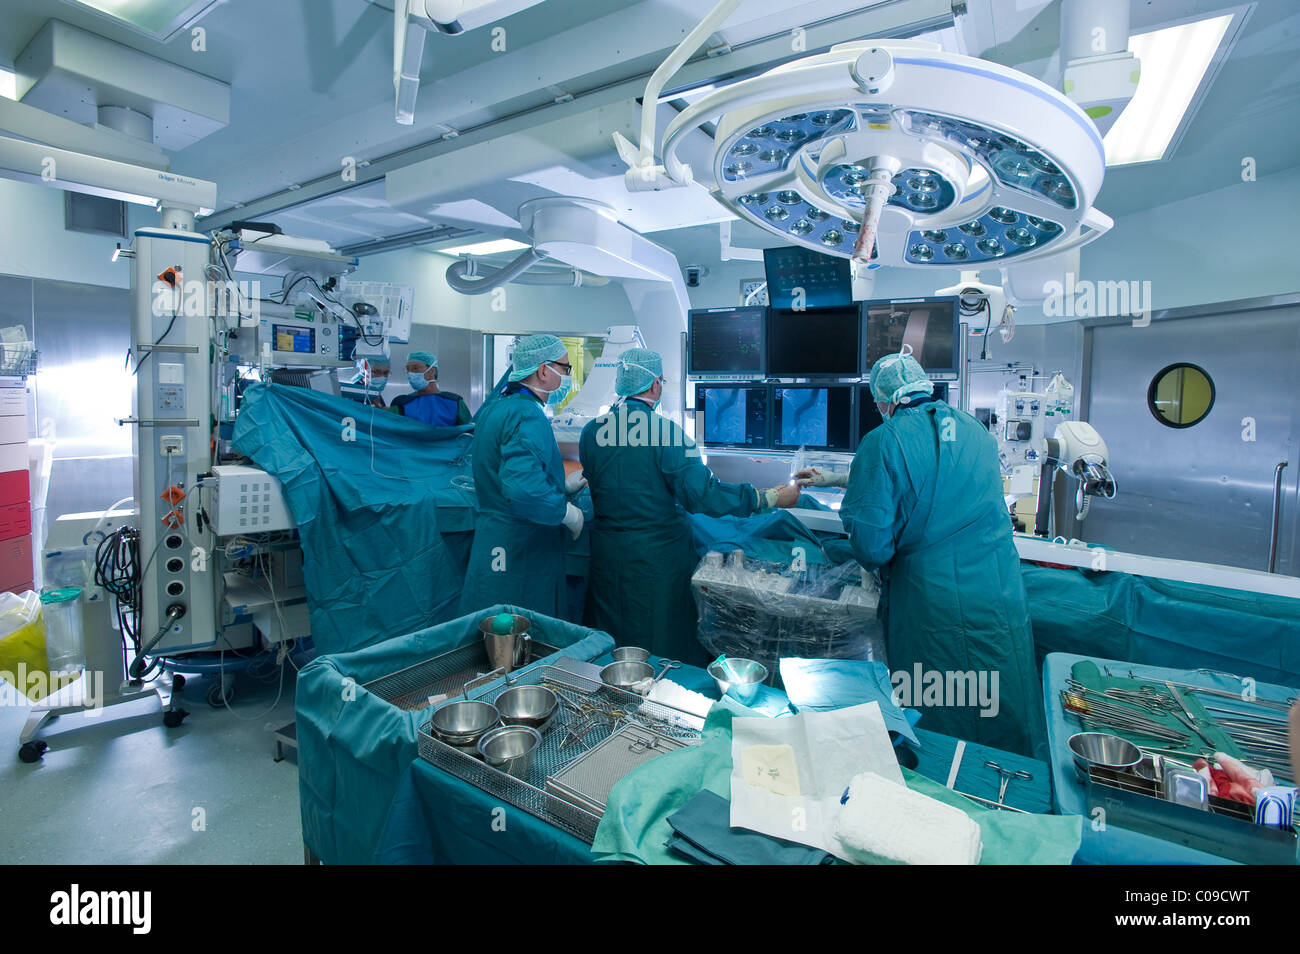 Chirurgie cardiaque dans une salle d'opération hybride, Deutsches Herzzentrum Berlin ou centre cardiaque Photo Stock